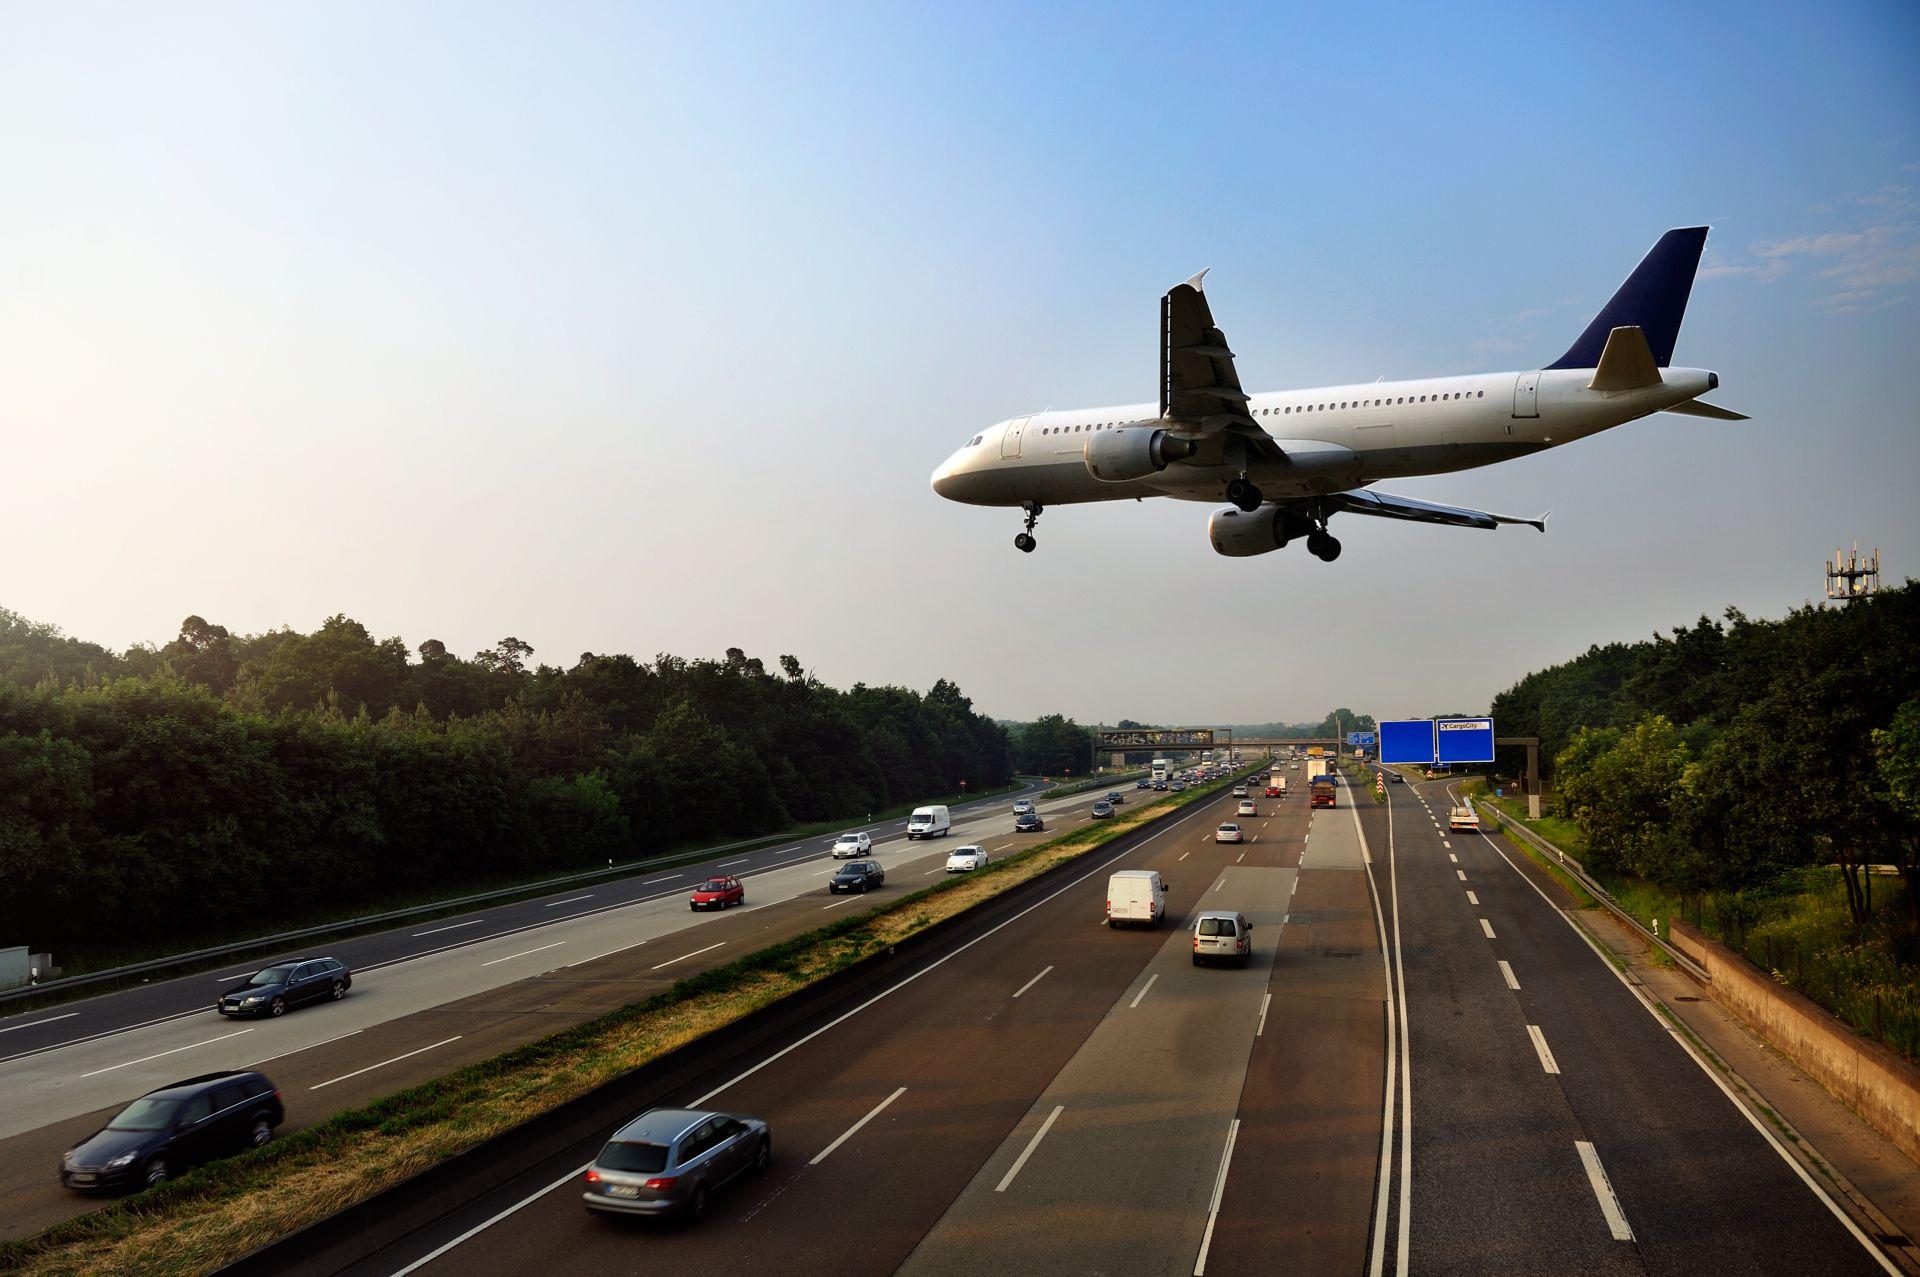 Низколетящий самолёт над шоссе